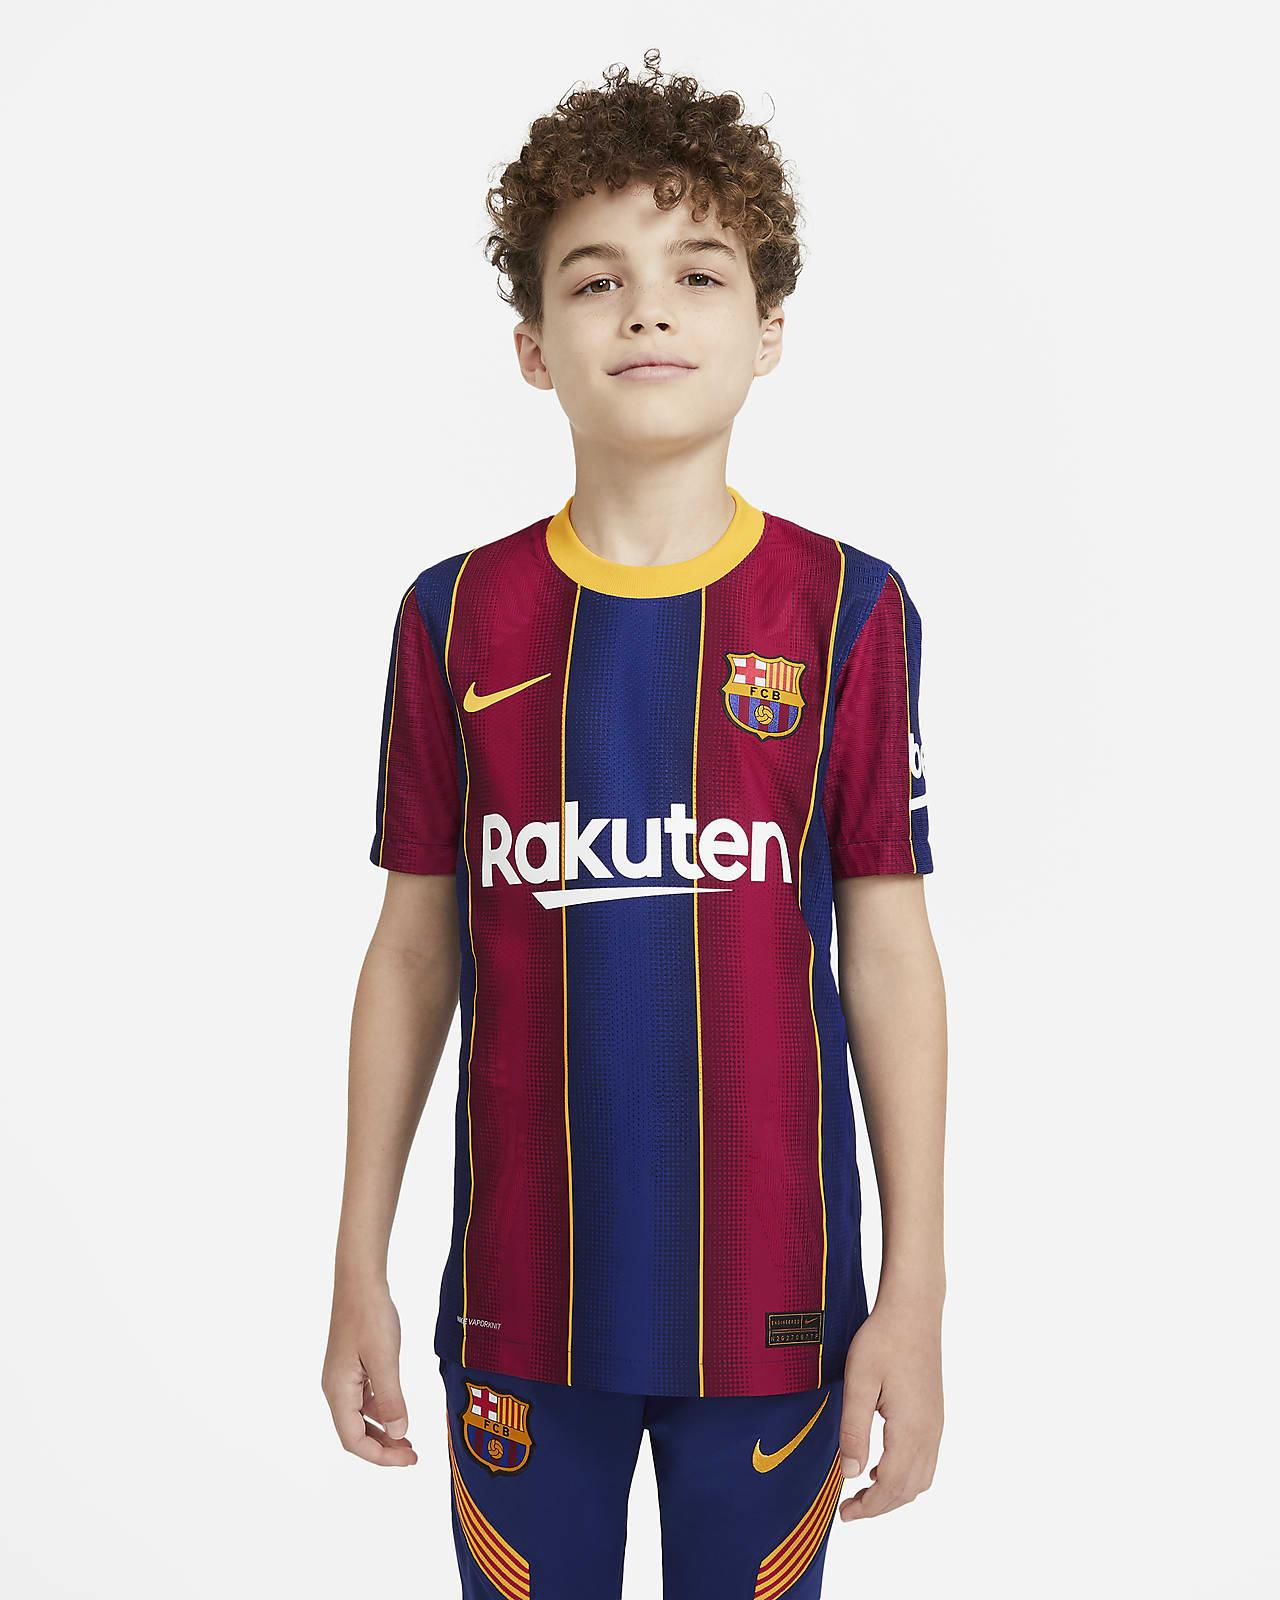 primera equipacion vapor match fc barcelona 2020 21 camiseta de futbol nino a nike es primera equipacion vapor match fc barcelona 2020 21 camiseta de futbol nino a